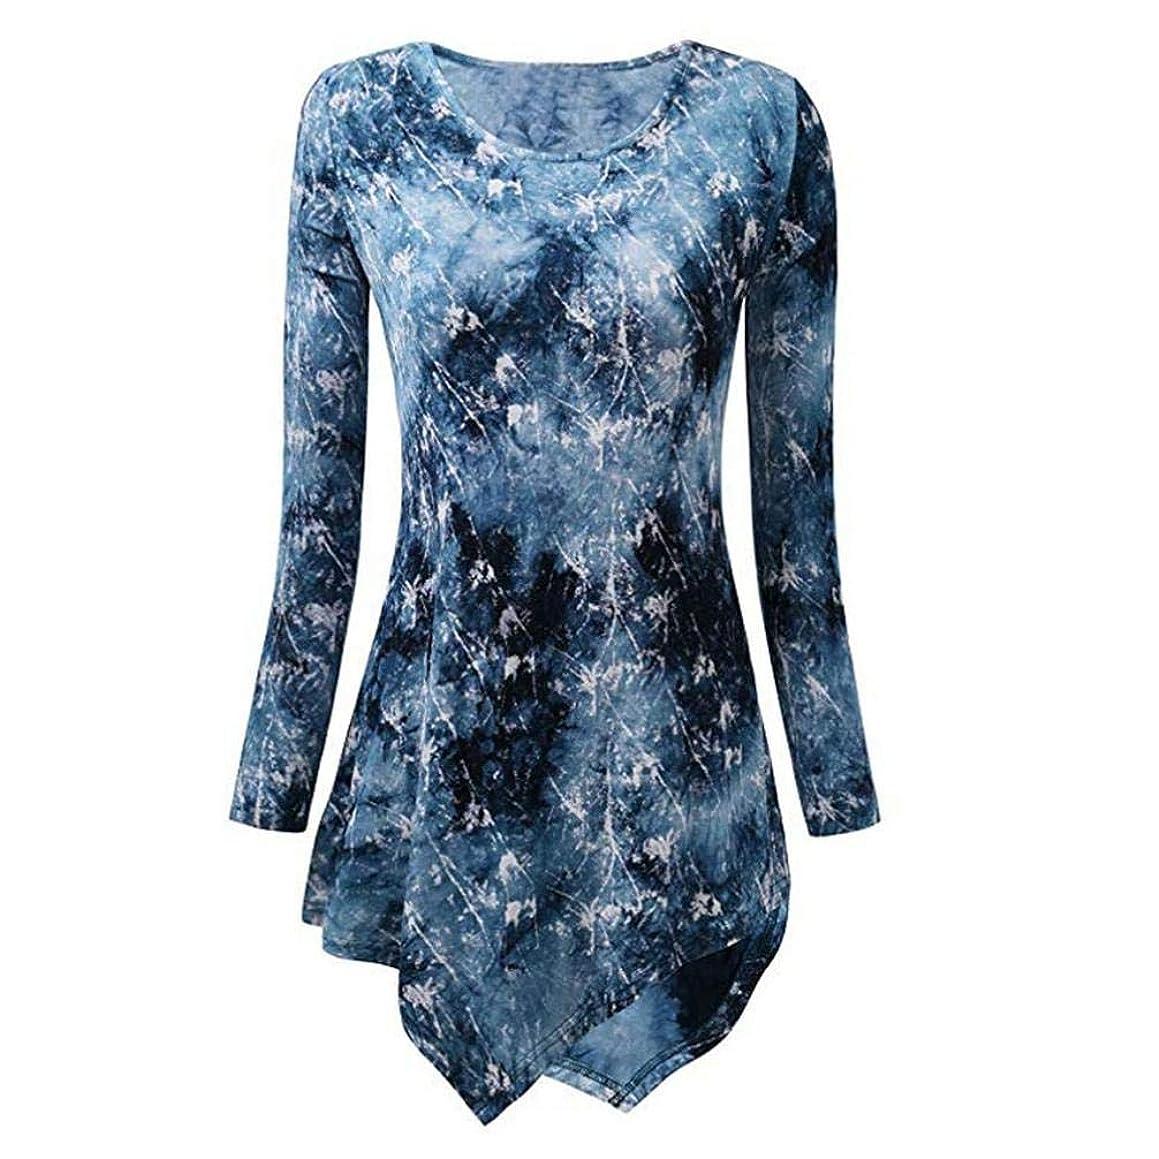 lotus.flower 2018 Fashion Womens Tie Dyed Asymmetrical Tunic Top O-Neck Long Sleeve T-Shirt Blouse (M, Blue)